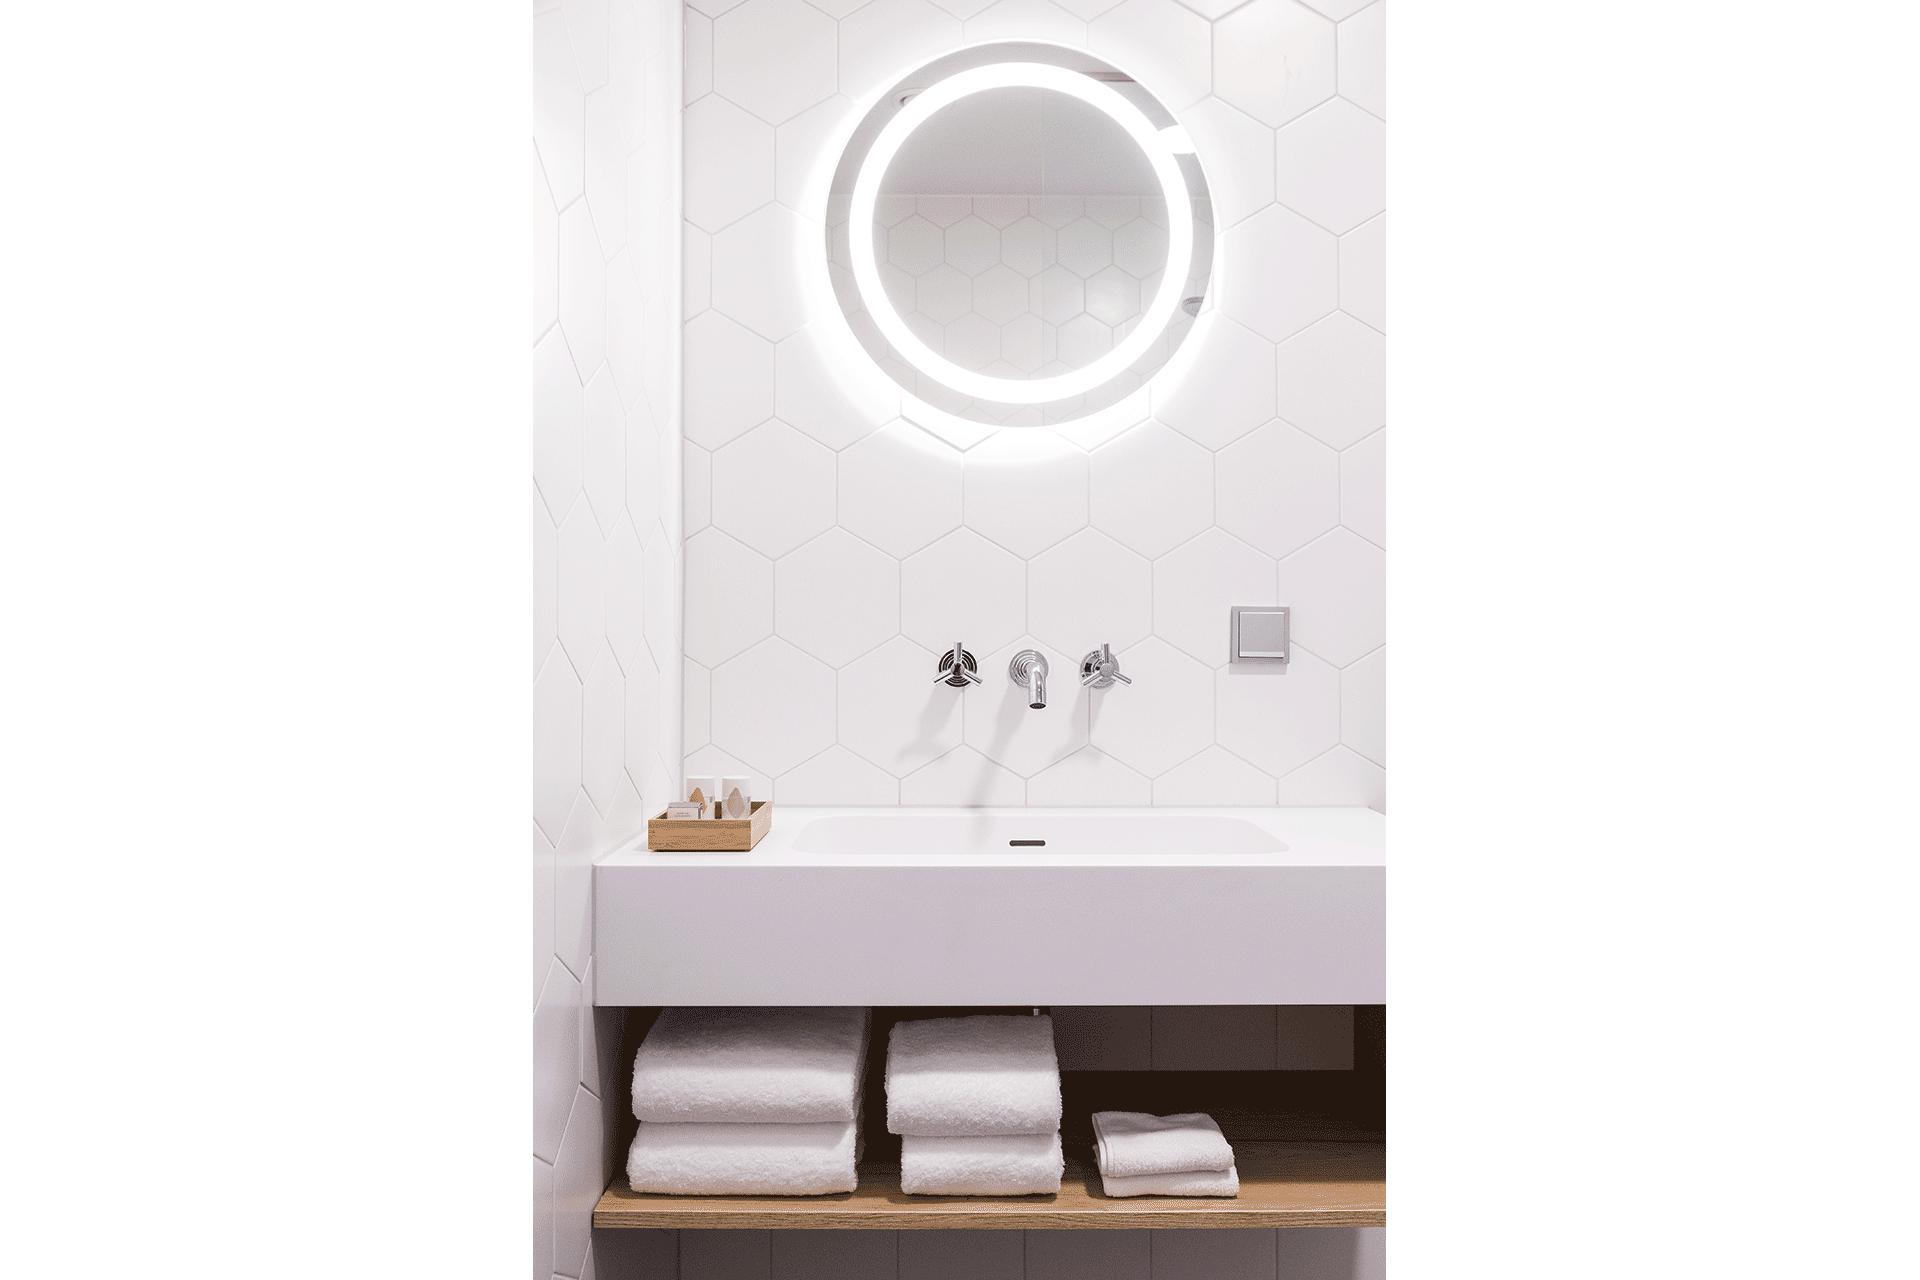 wasbak wit only white rond spiegel ronde cirkel hexagonale tegel bijzondere tegels badkamer hotel